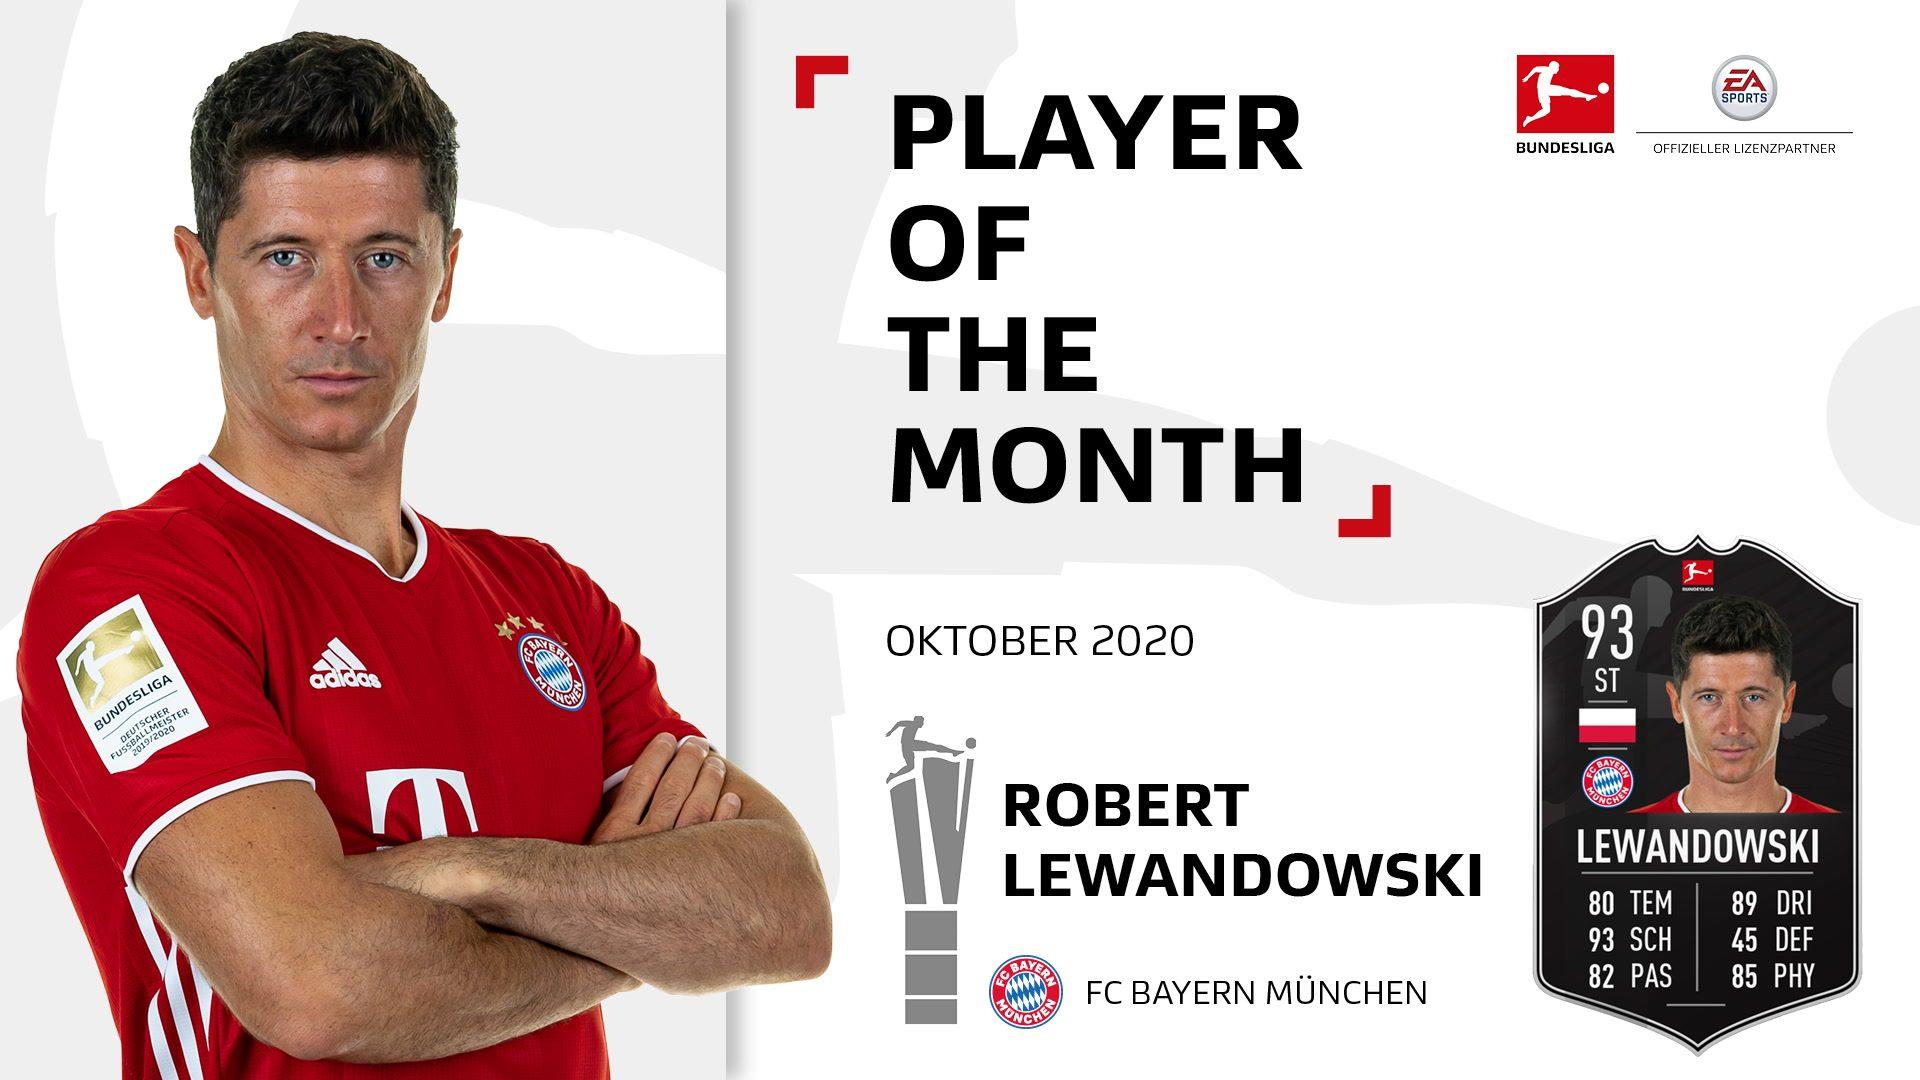 Robert Lewandowski ist Spieler des Monats Oktober